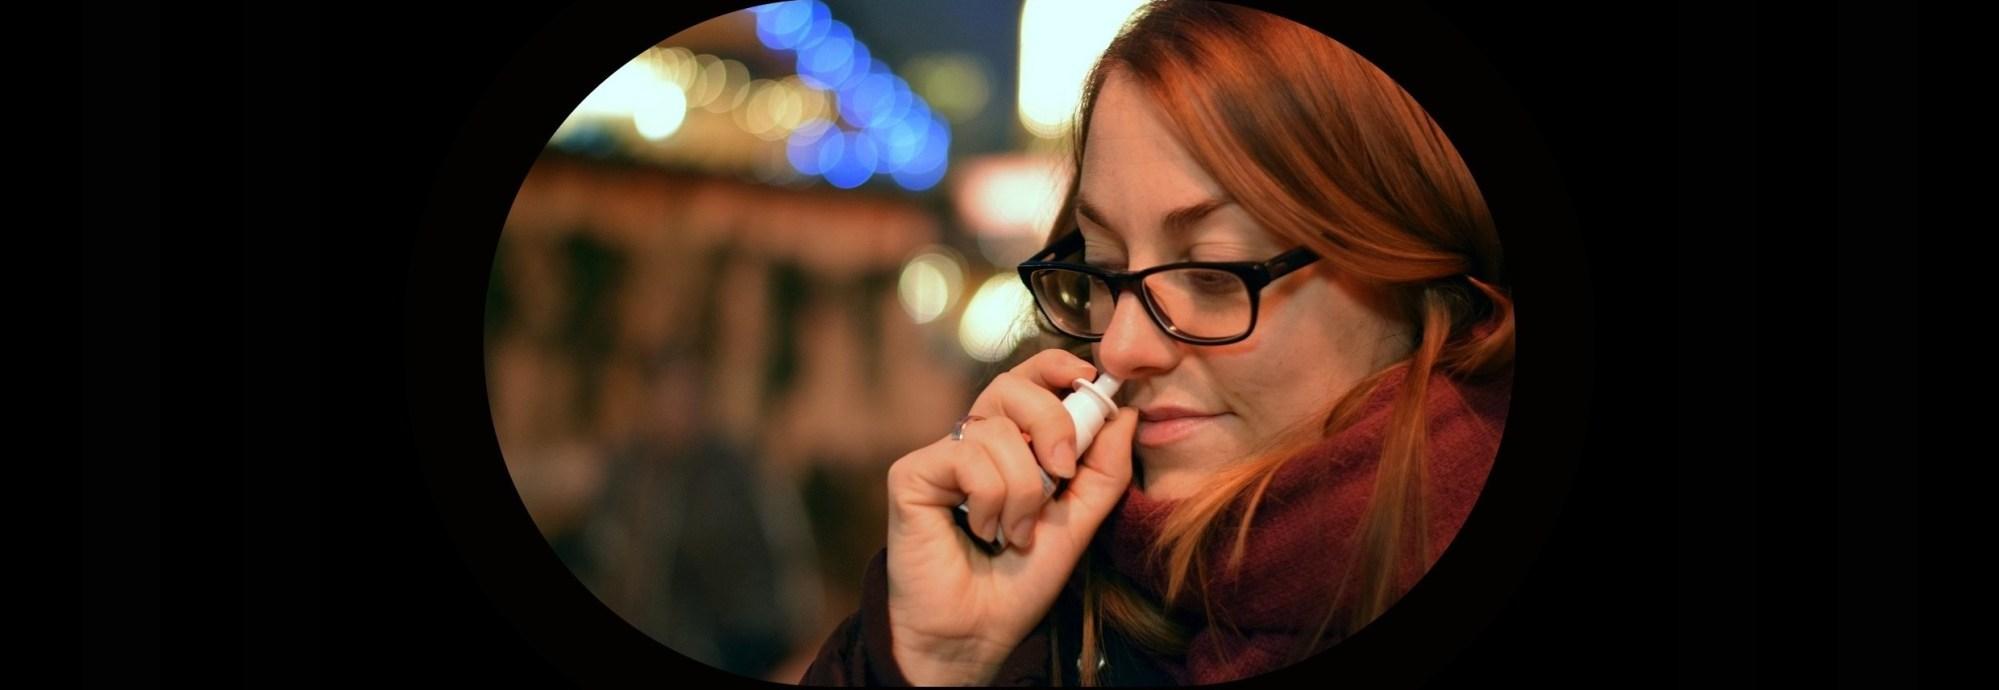 sinus infection treatment - nasal sprays